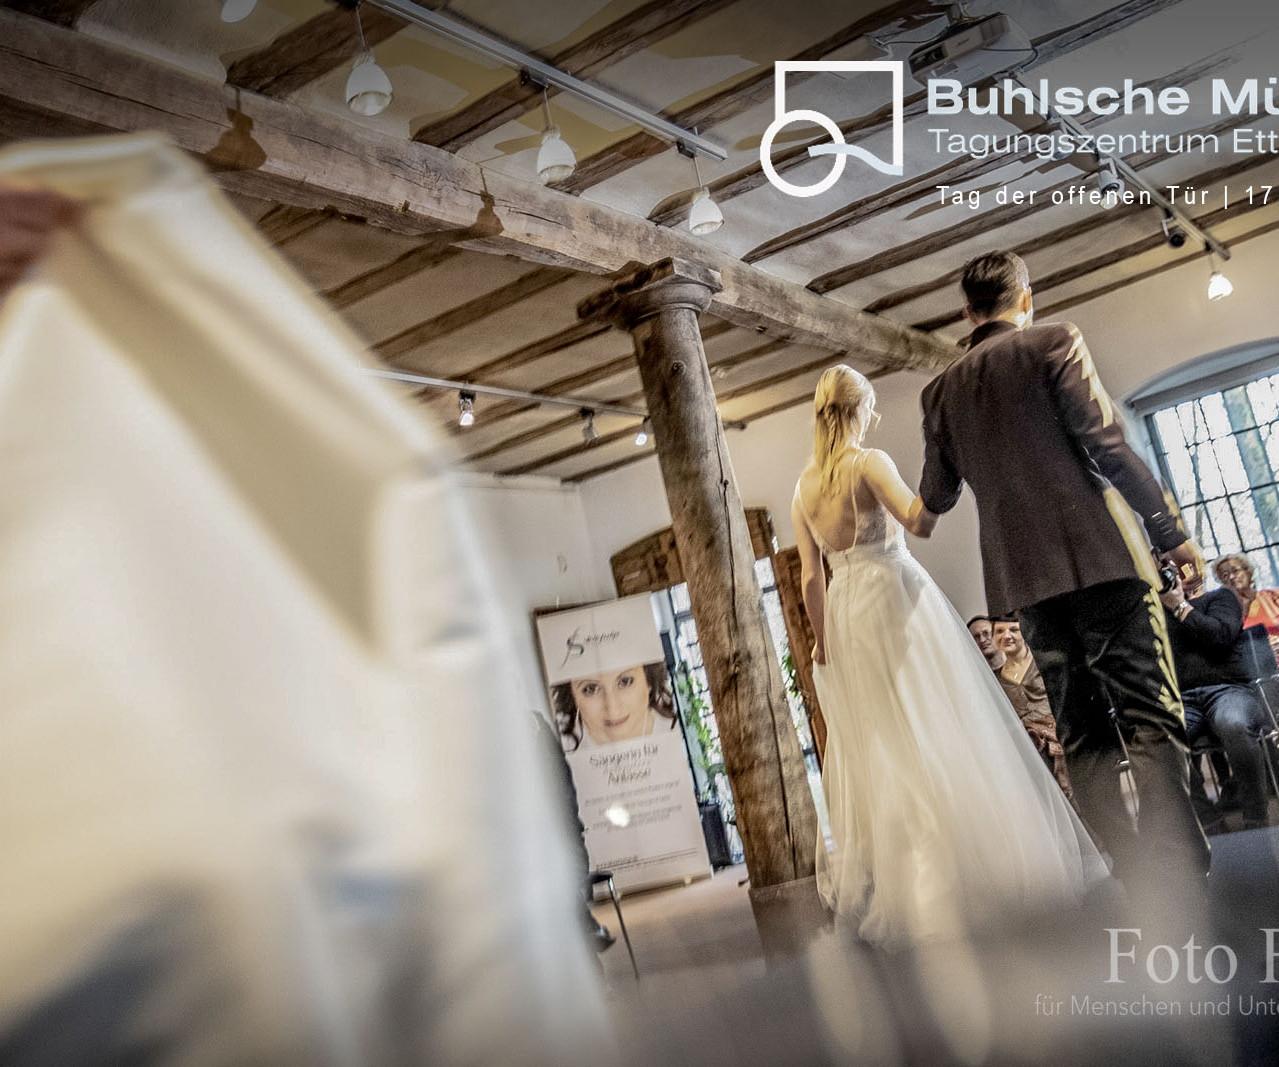 20190217_BuhlscheMühle_FB3